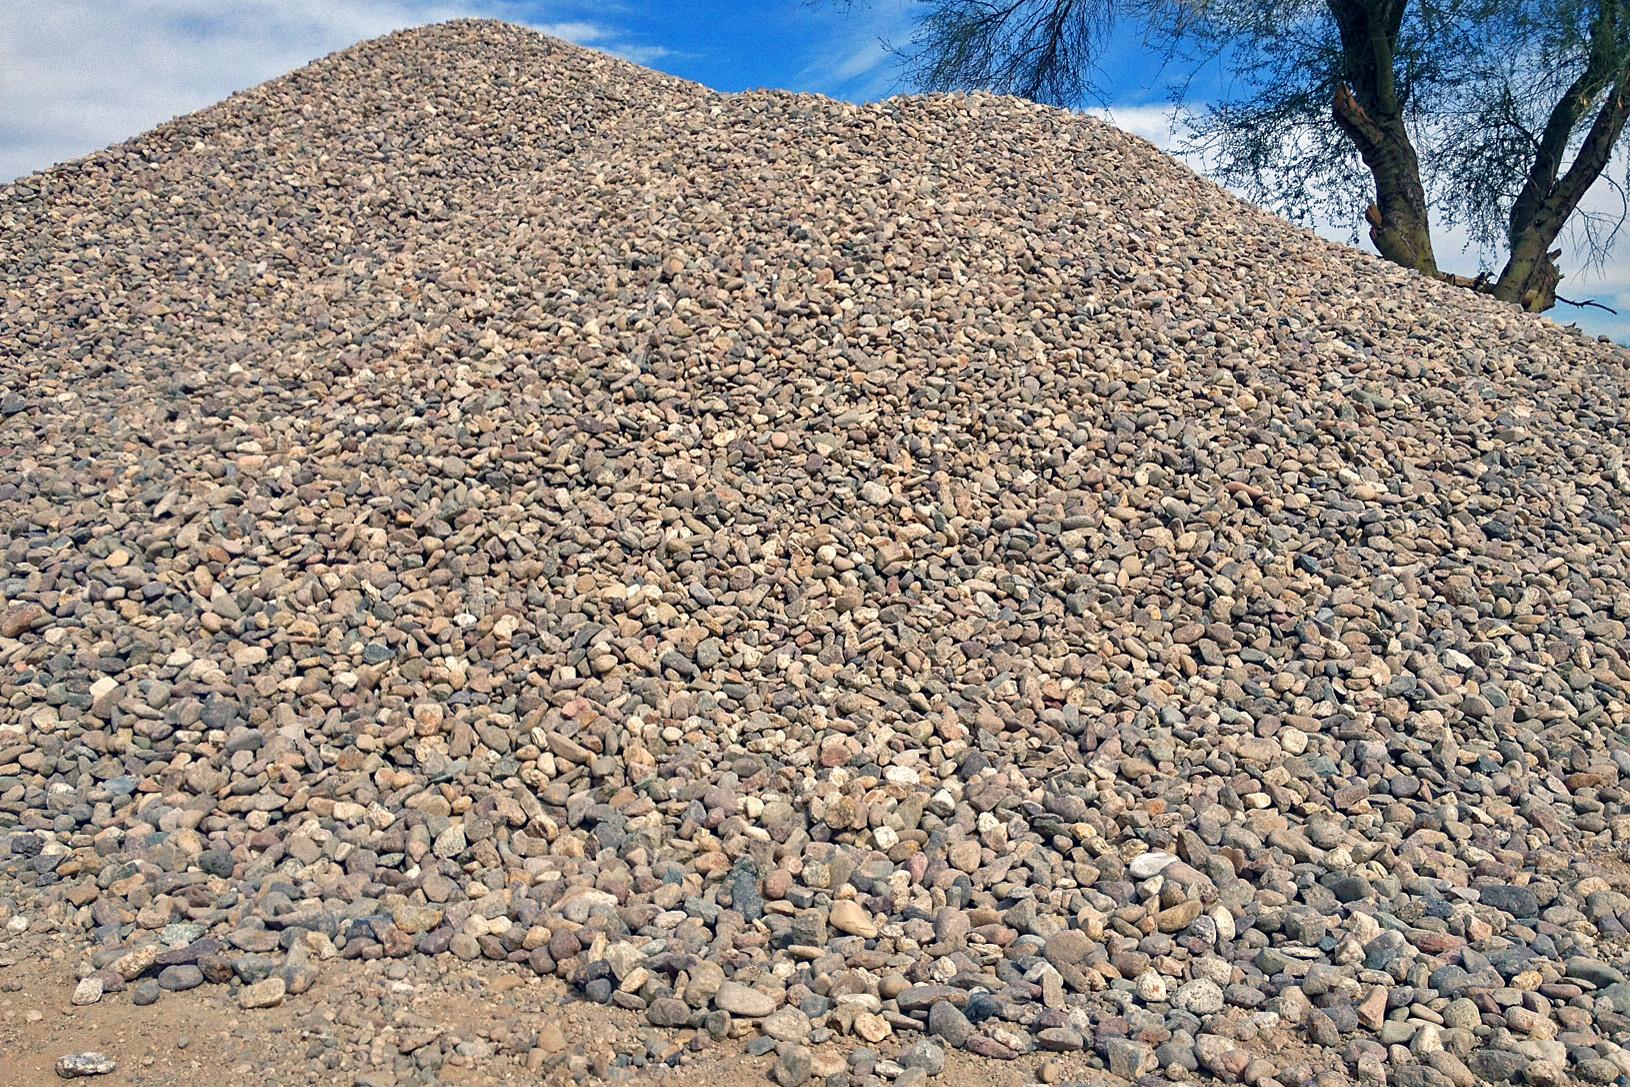 01TRK-Tumbled-River-Rock-Pile